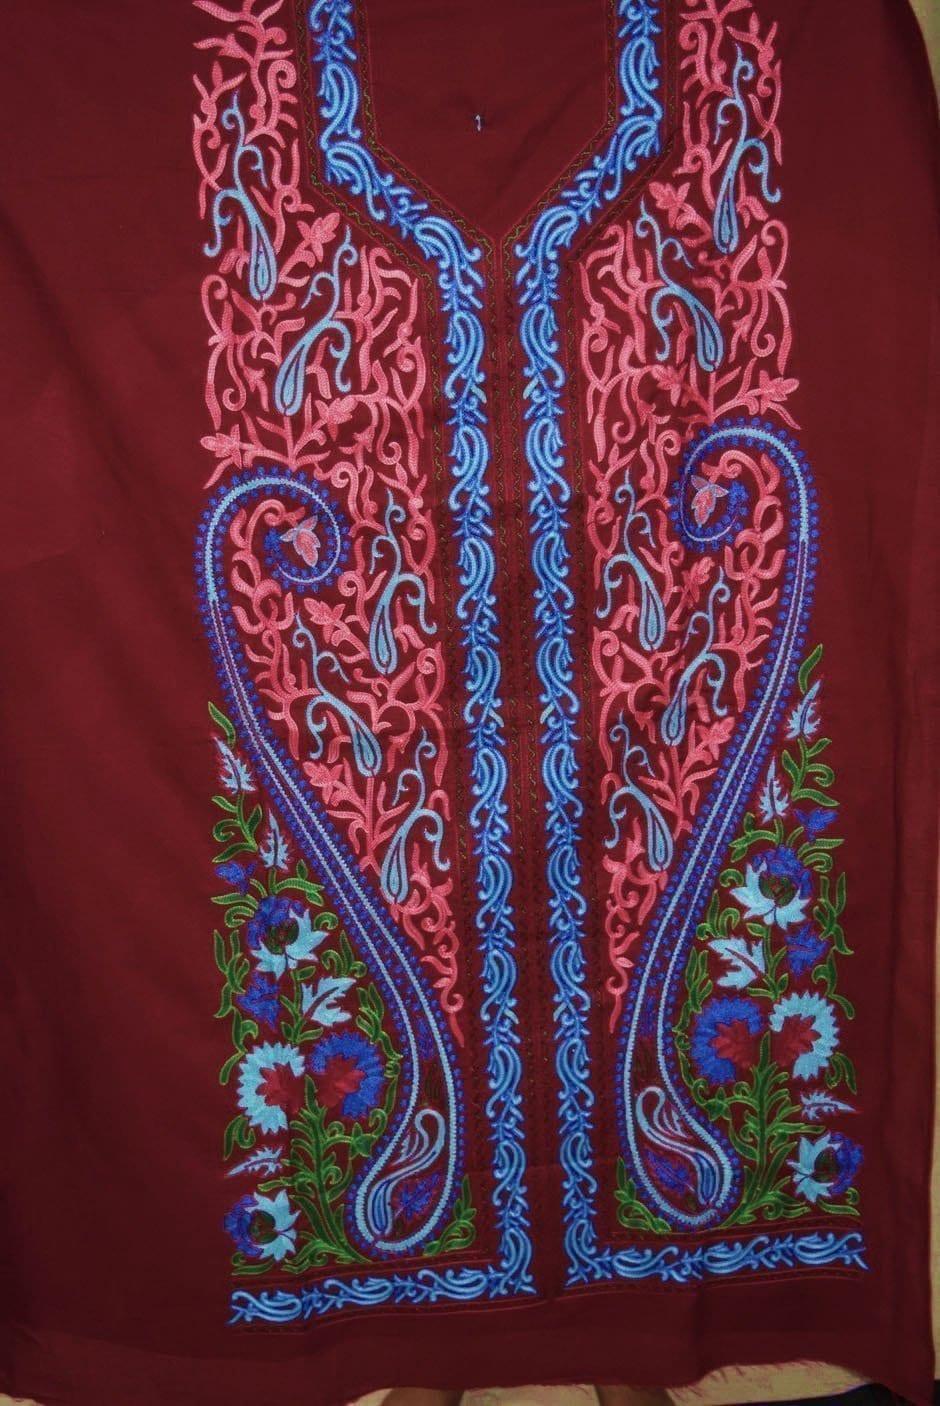 Kashmiri Embroidery Cotton Salwar Suit Fabric with matching chiffon dupatta C0640 4